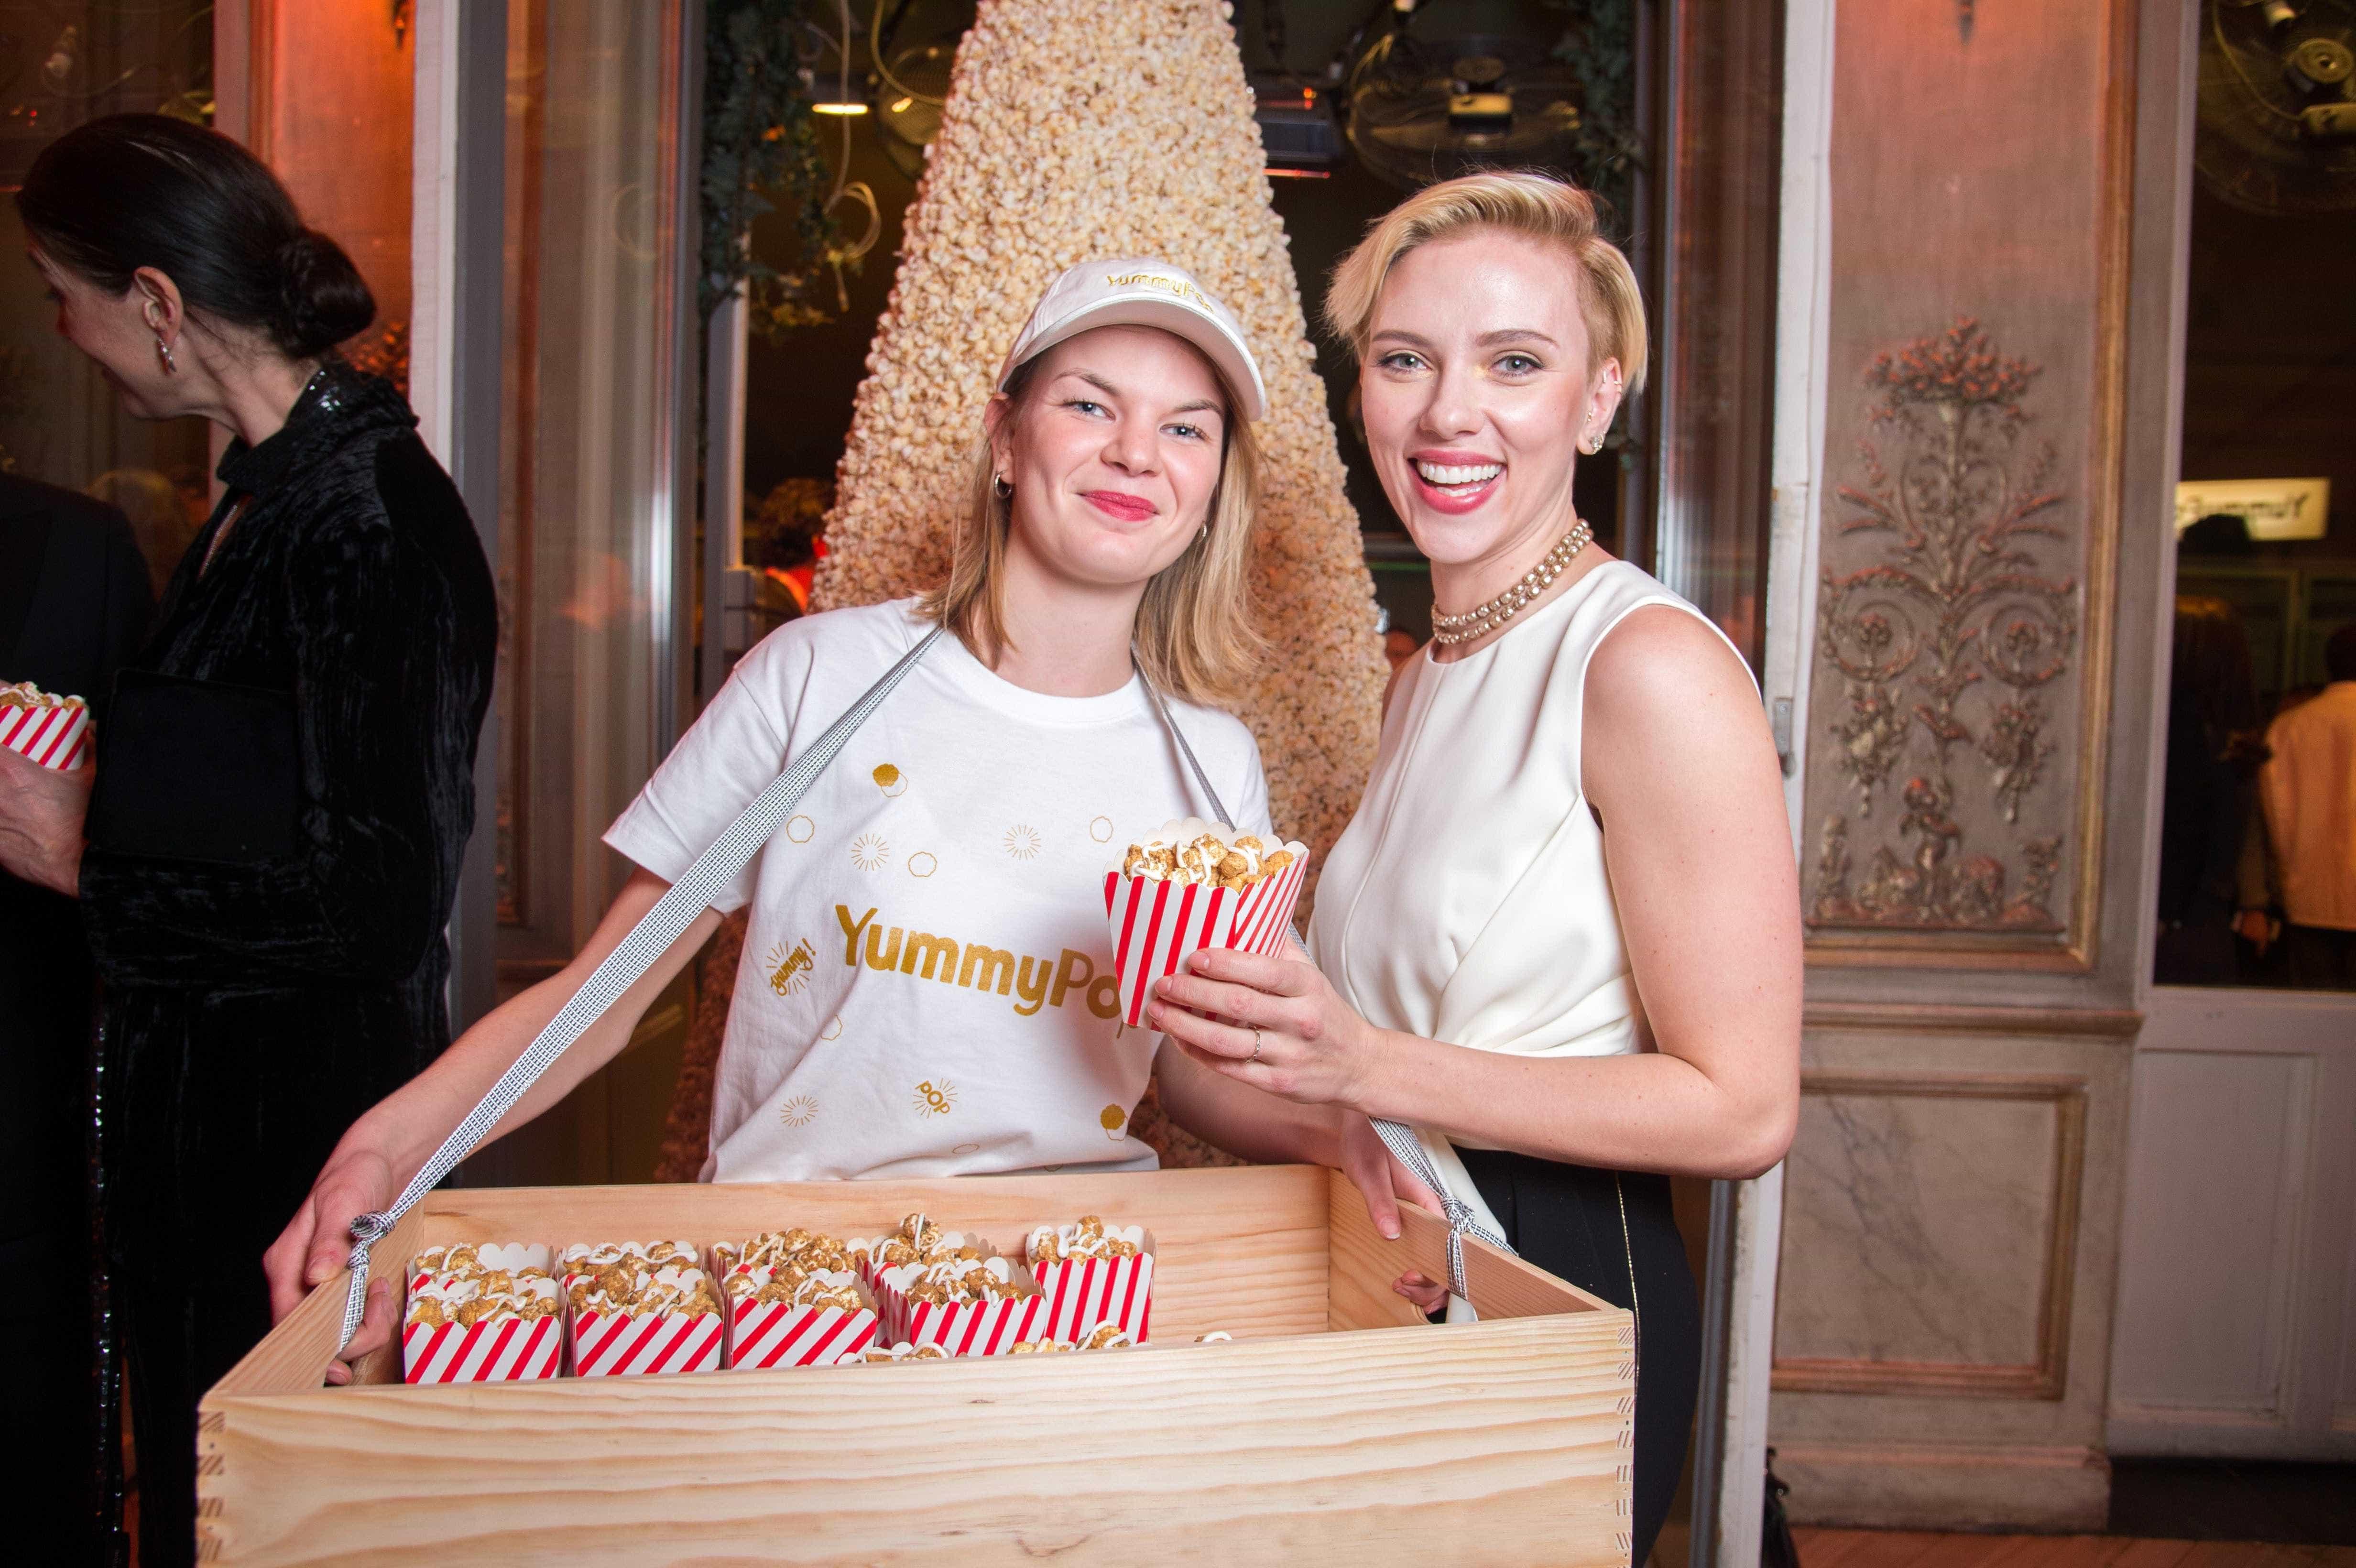 Scarlett Johansson deslumbrante na abertura da sua loja de pipocas -